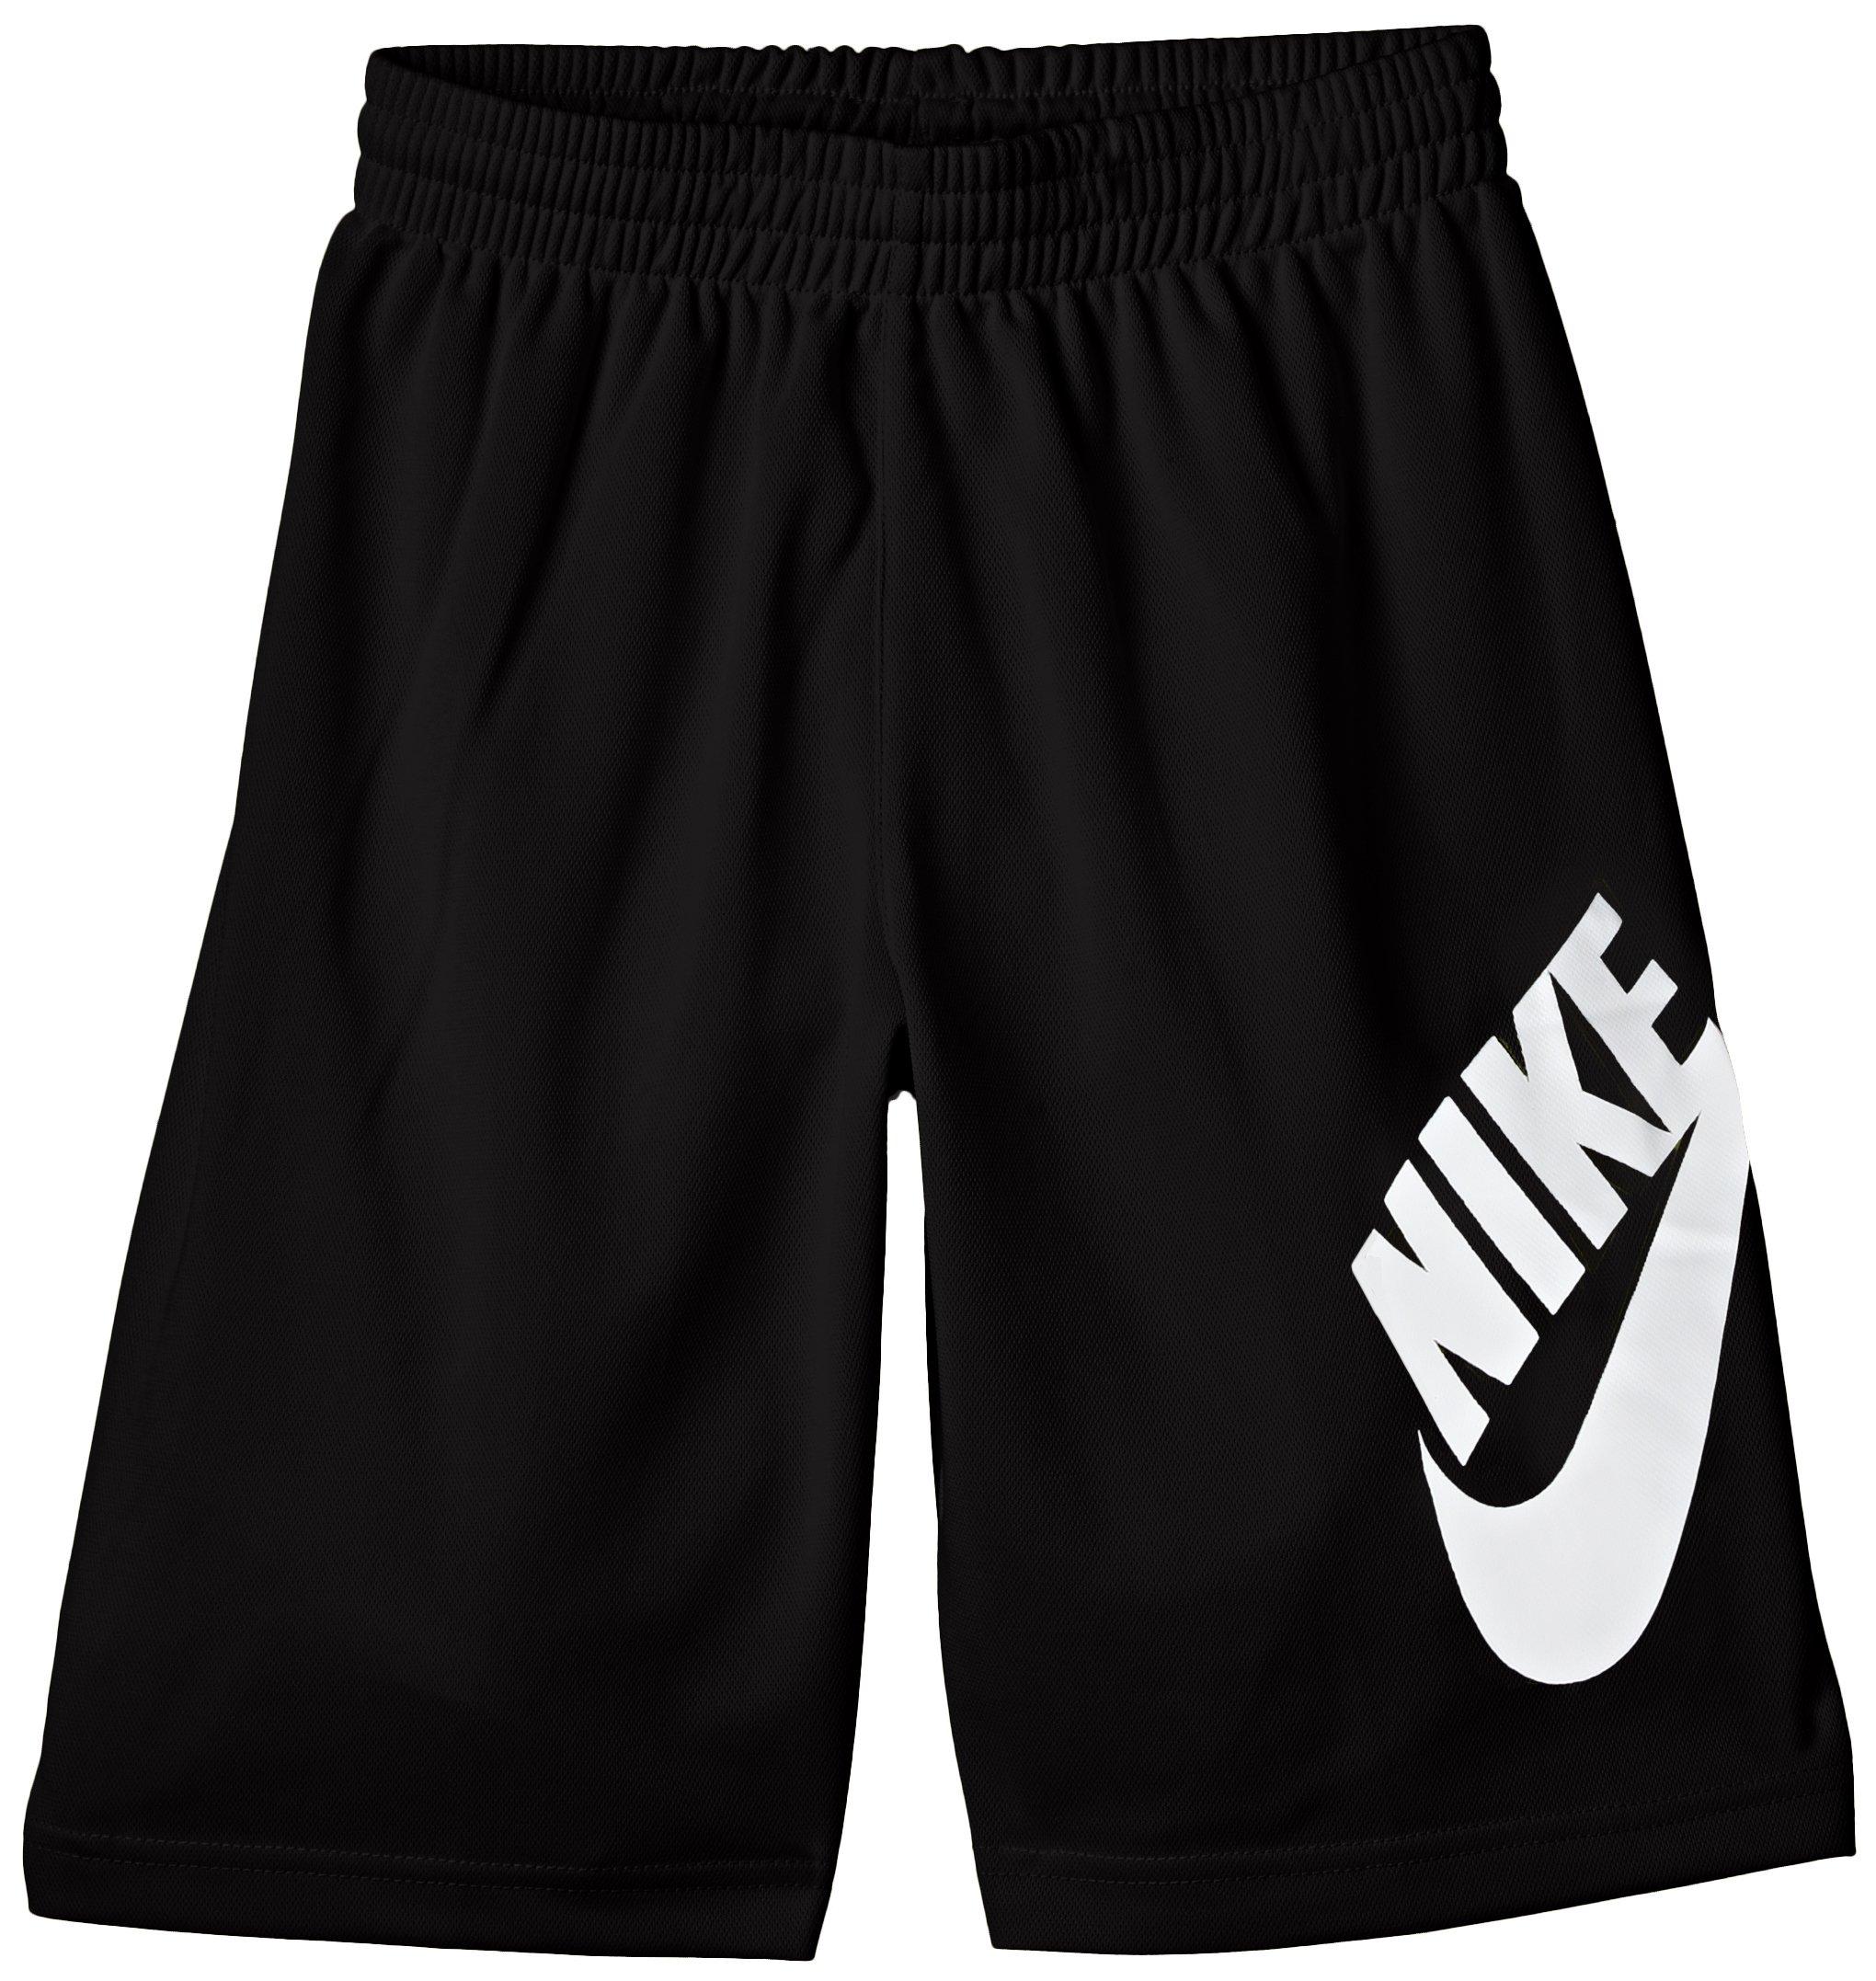 Boys Youth Nike SB Logo Dri Fit Shorts (M (10-12 Years), Black/White) by NIKE